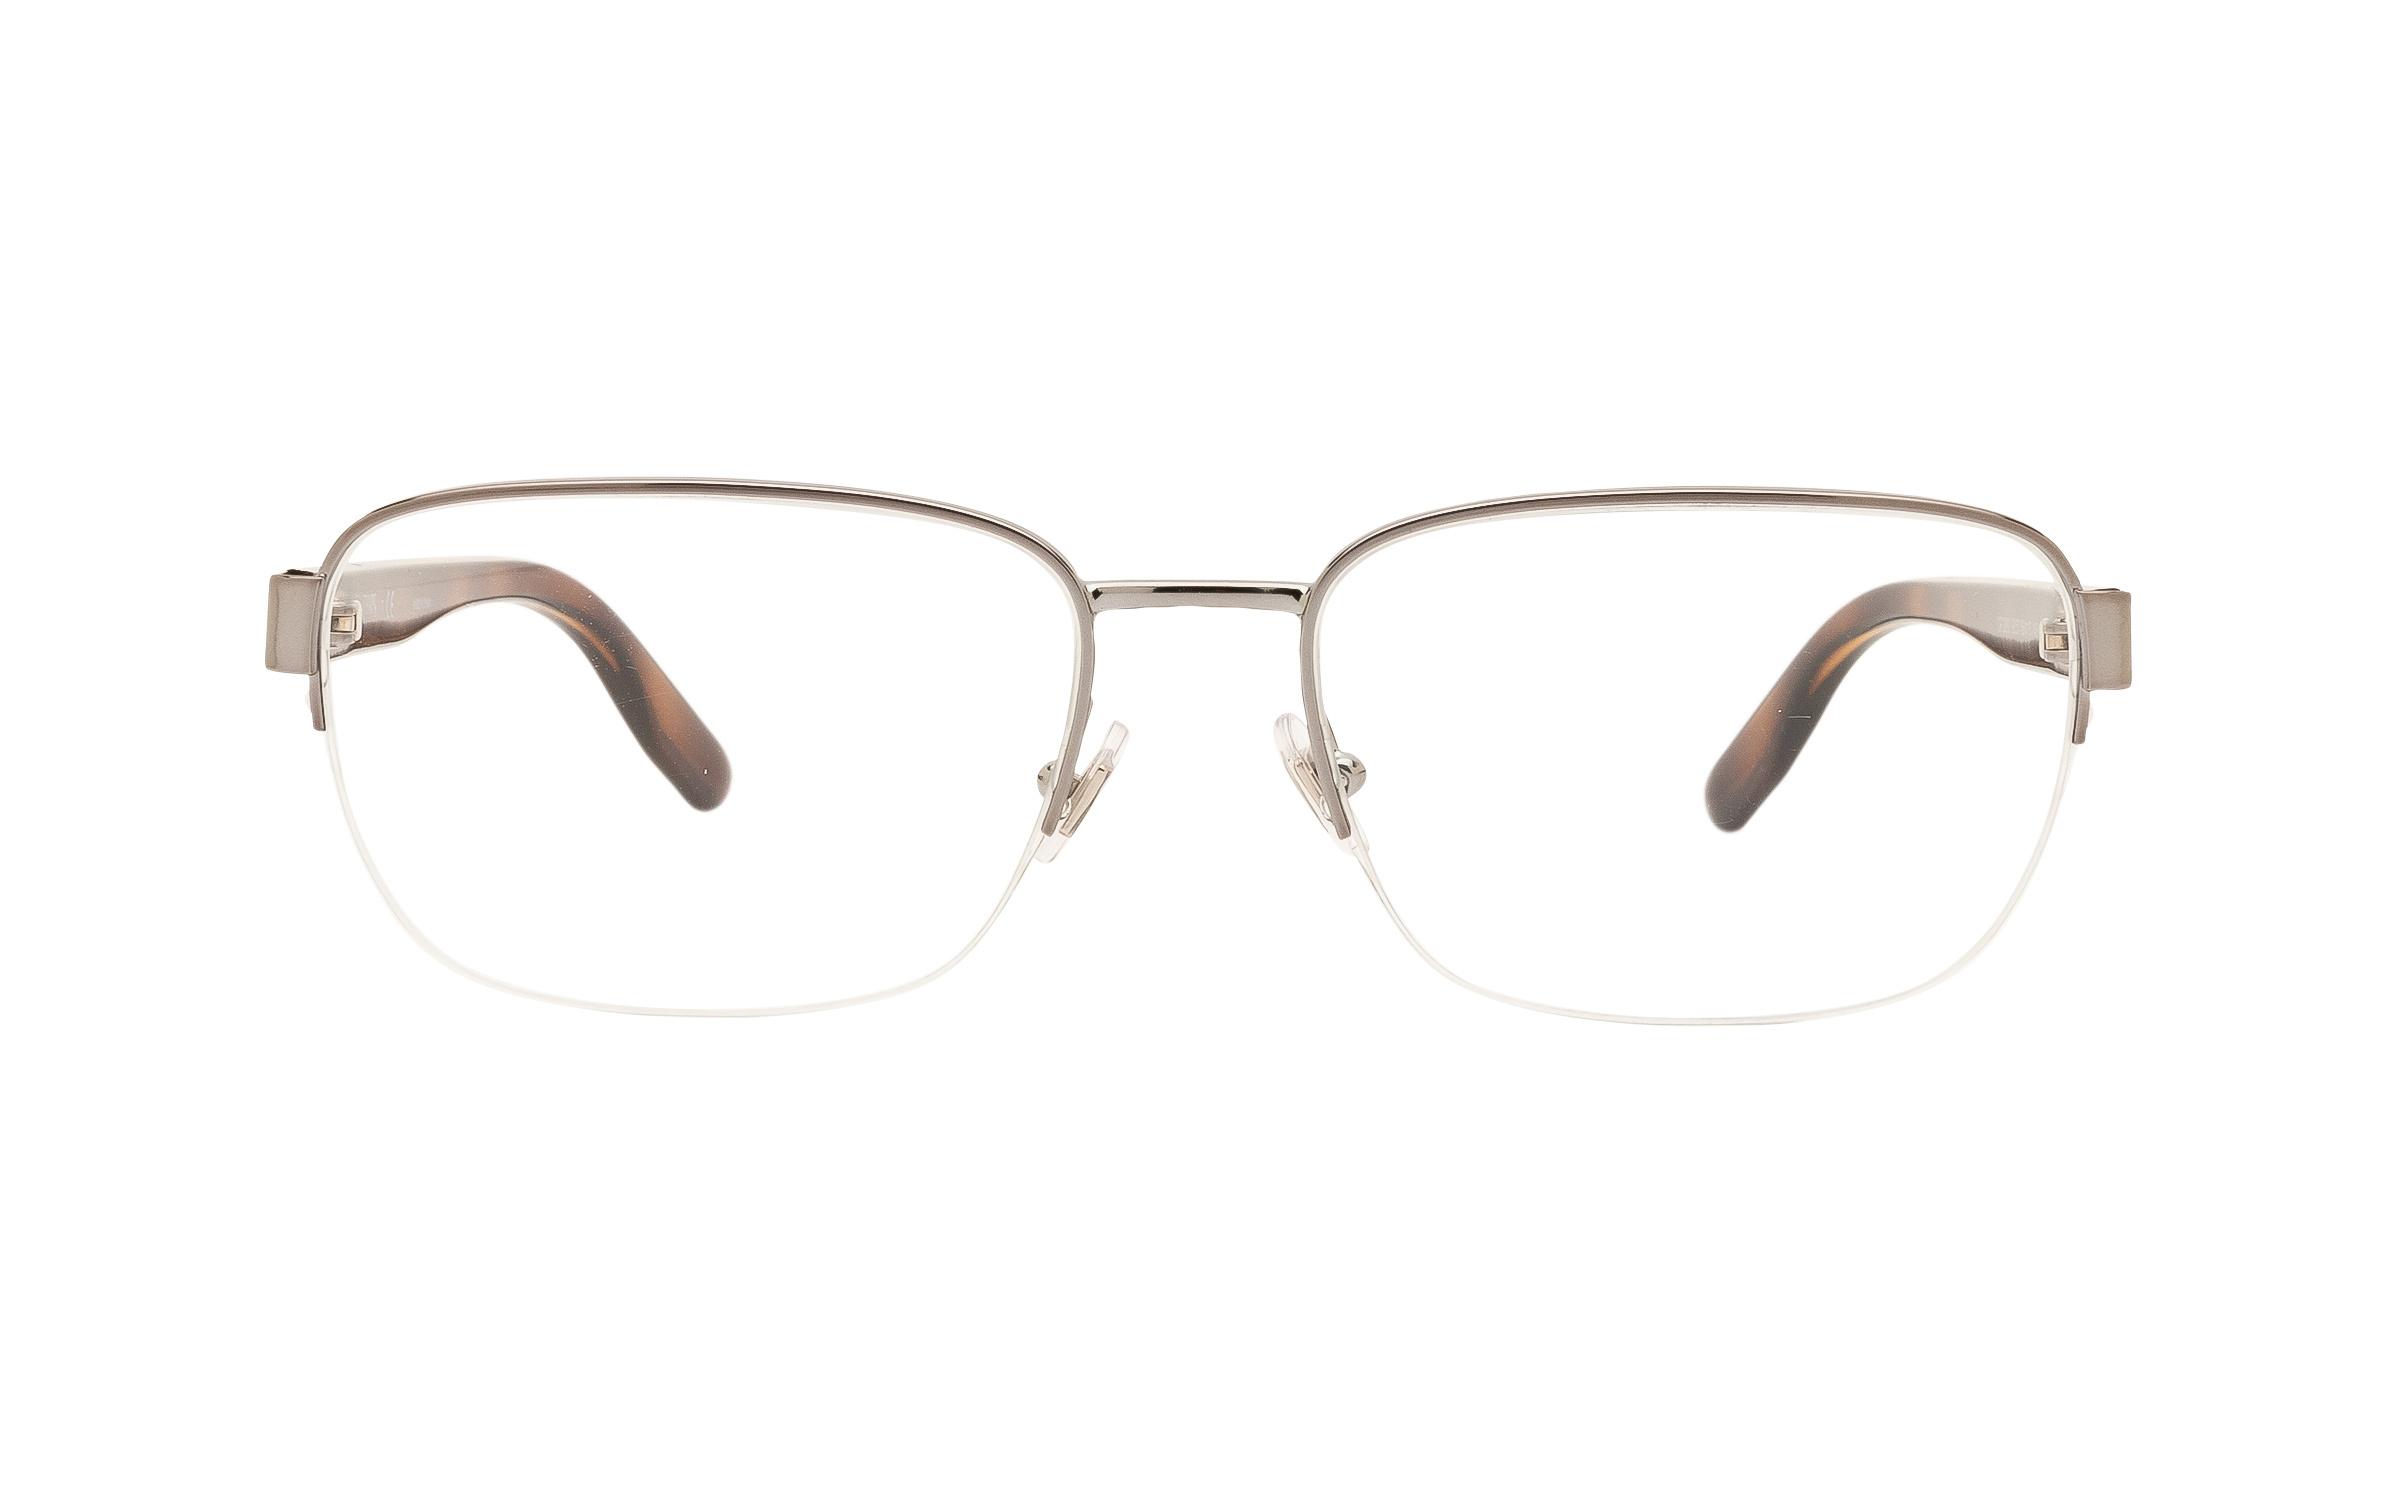 coastal.com - Chaps CP2090 9050 (56) Eyeglasses and Frame in Gunmetal Grey | Acetate/Metal – Online Coastal 91.00 USD